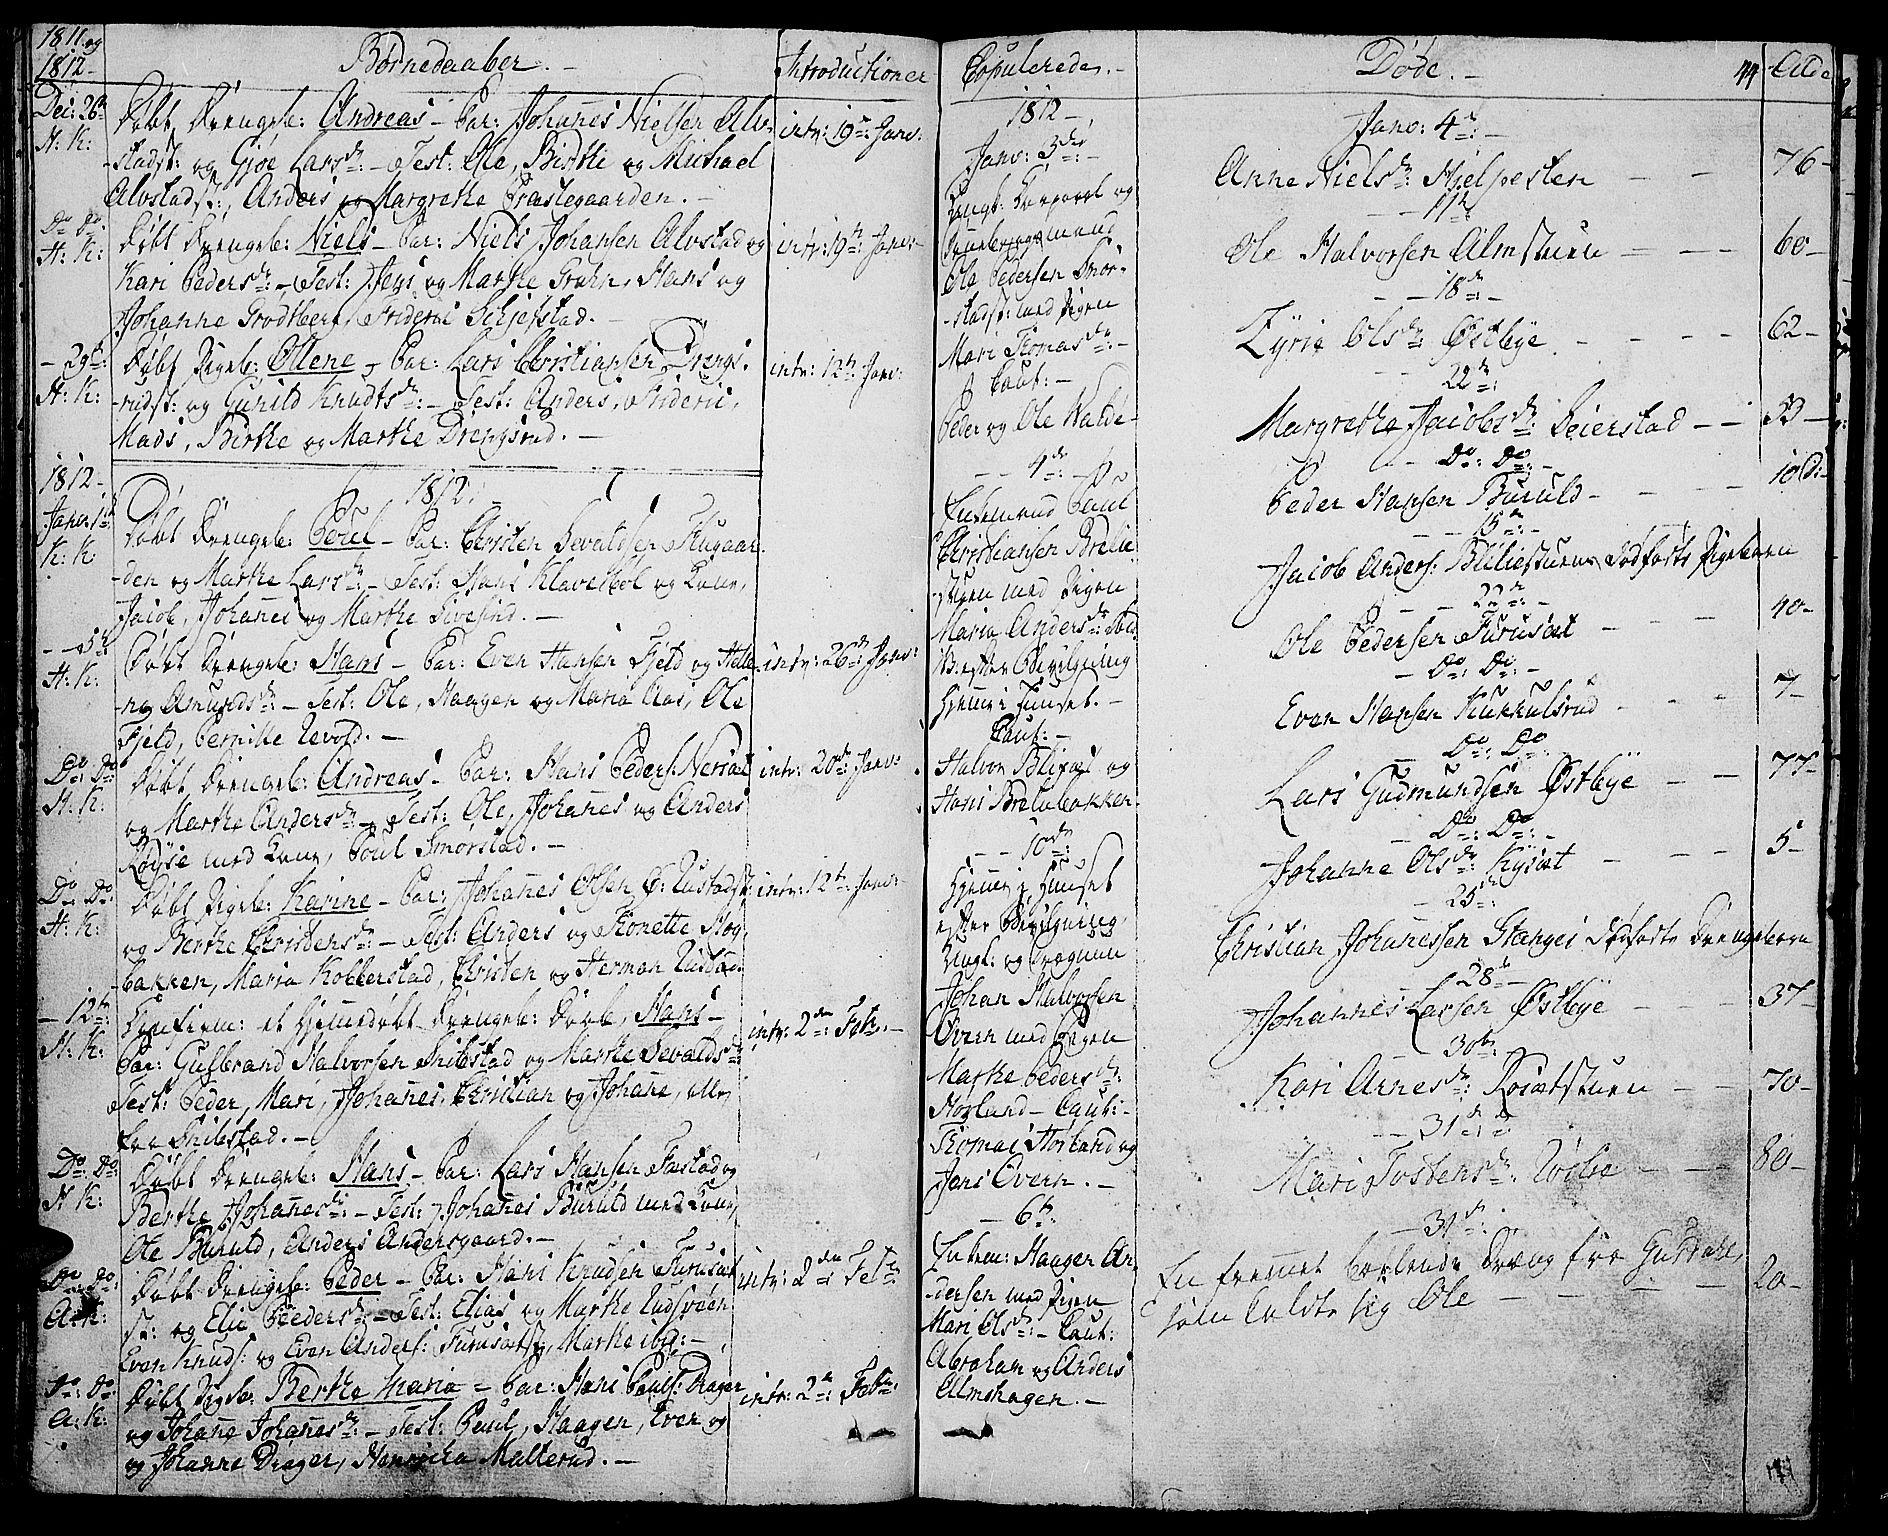 SAH, Toten prestekontor, Ministerialbok nr. 8, 1809-1814, s. 44